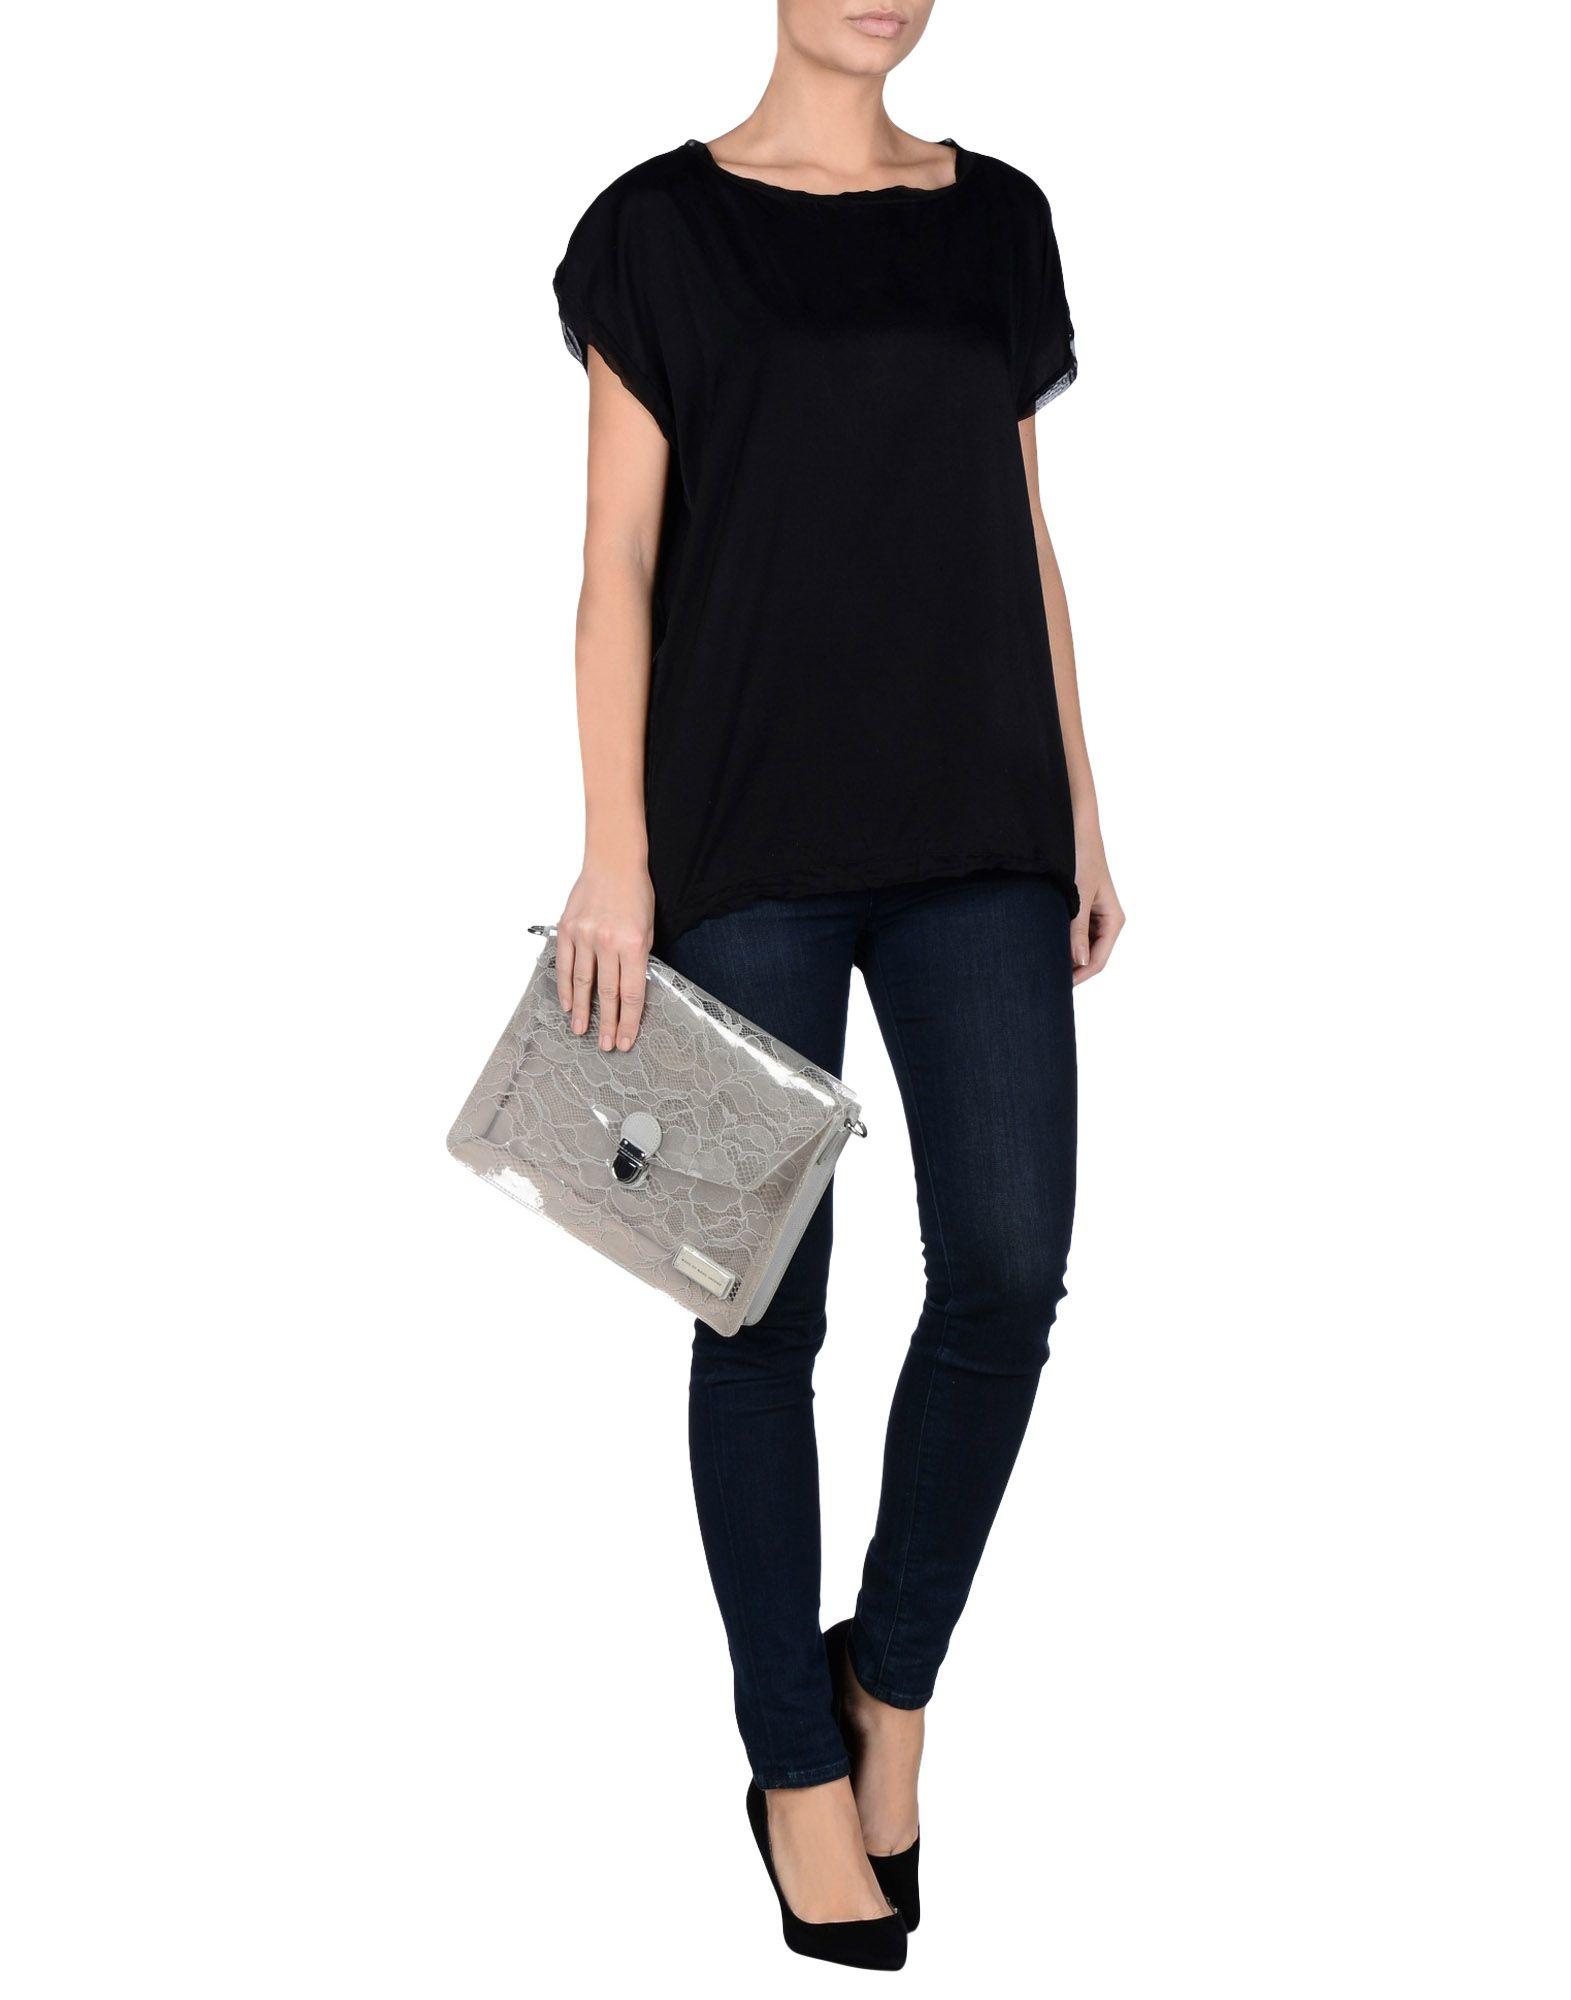 marc by marc jacobs handbag in gray lyst. Black Bedroom Furniture Sets. Home Design Ideas